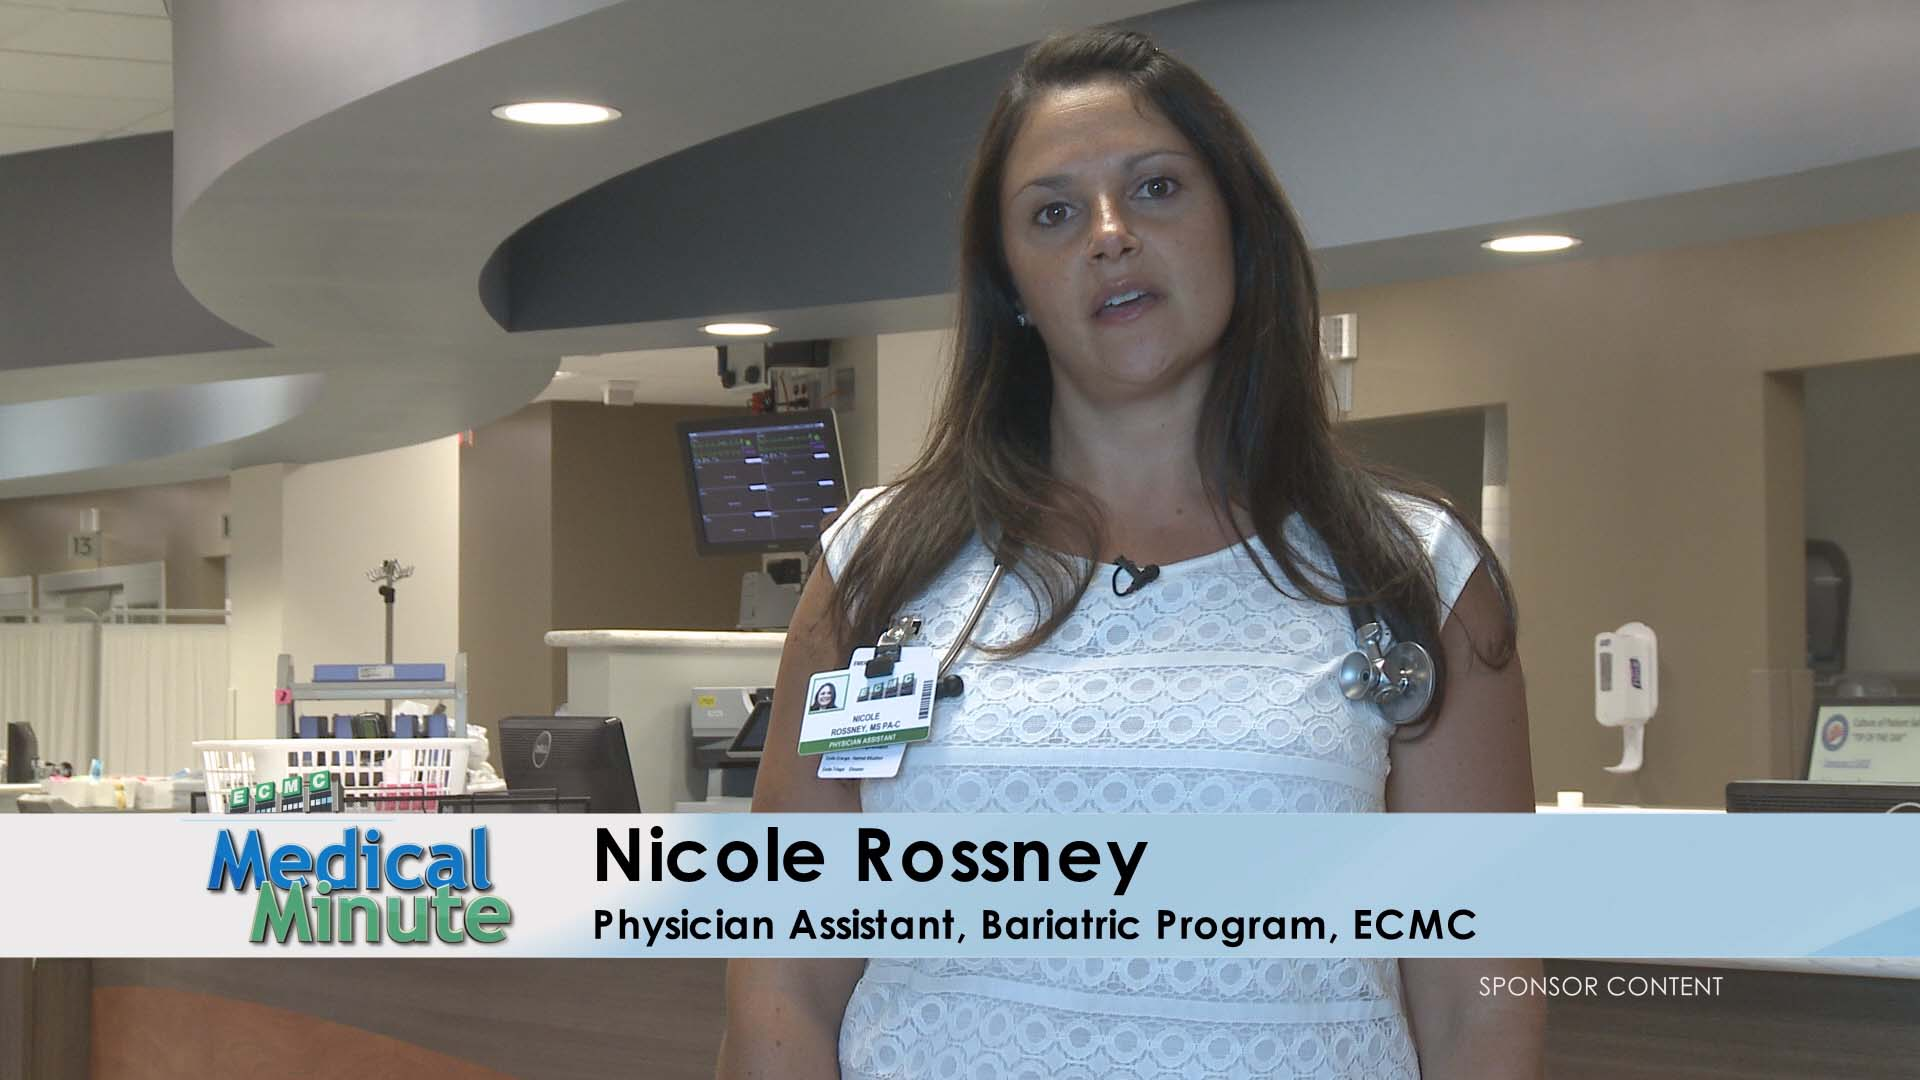 ecmc-medical-minute-nicole-rossney-obesity-092616-still